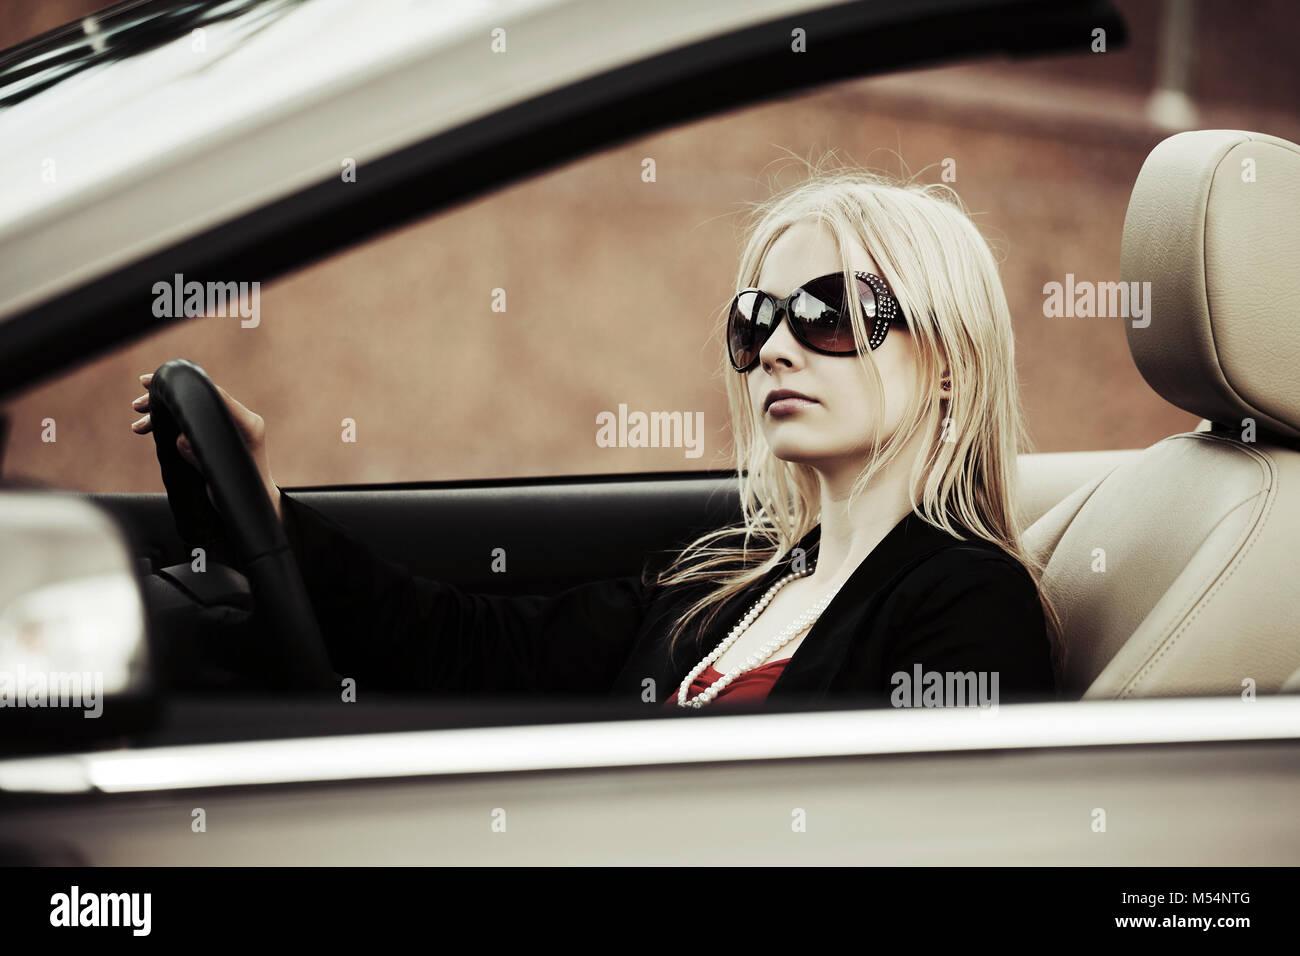 Young woman driving convertible car - Stock Image